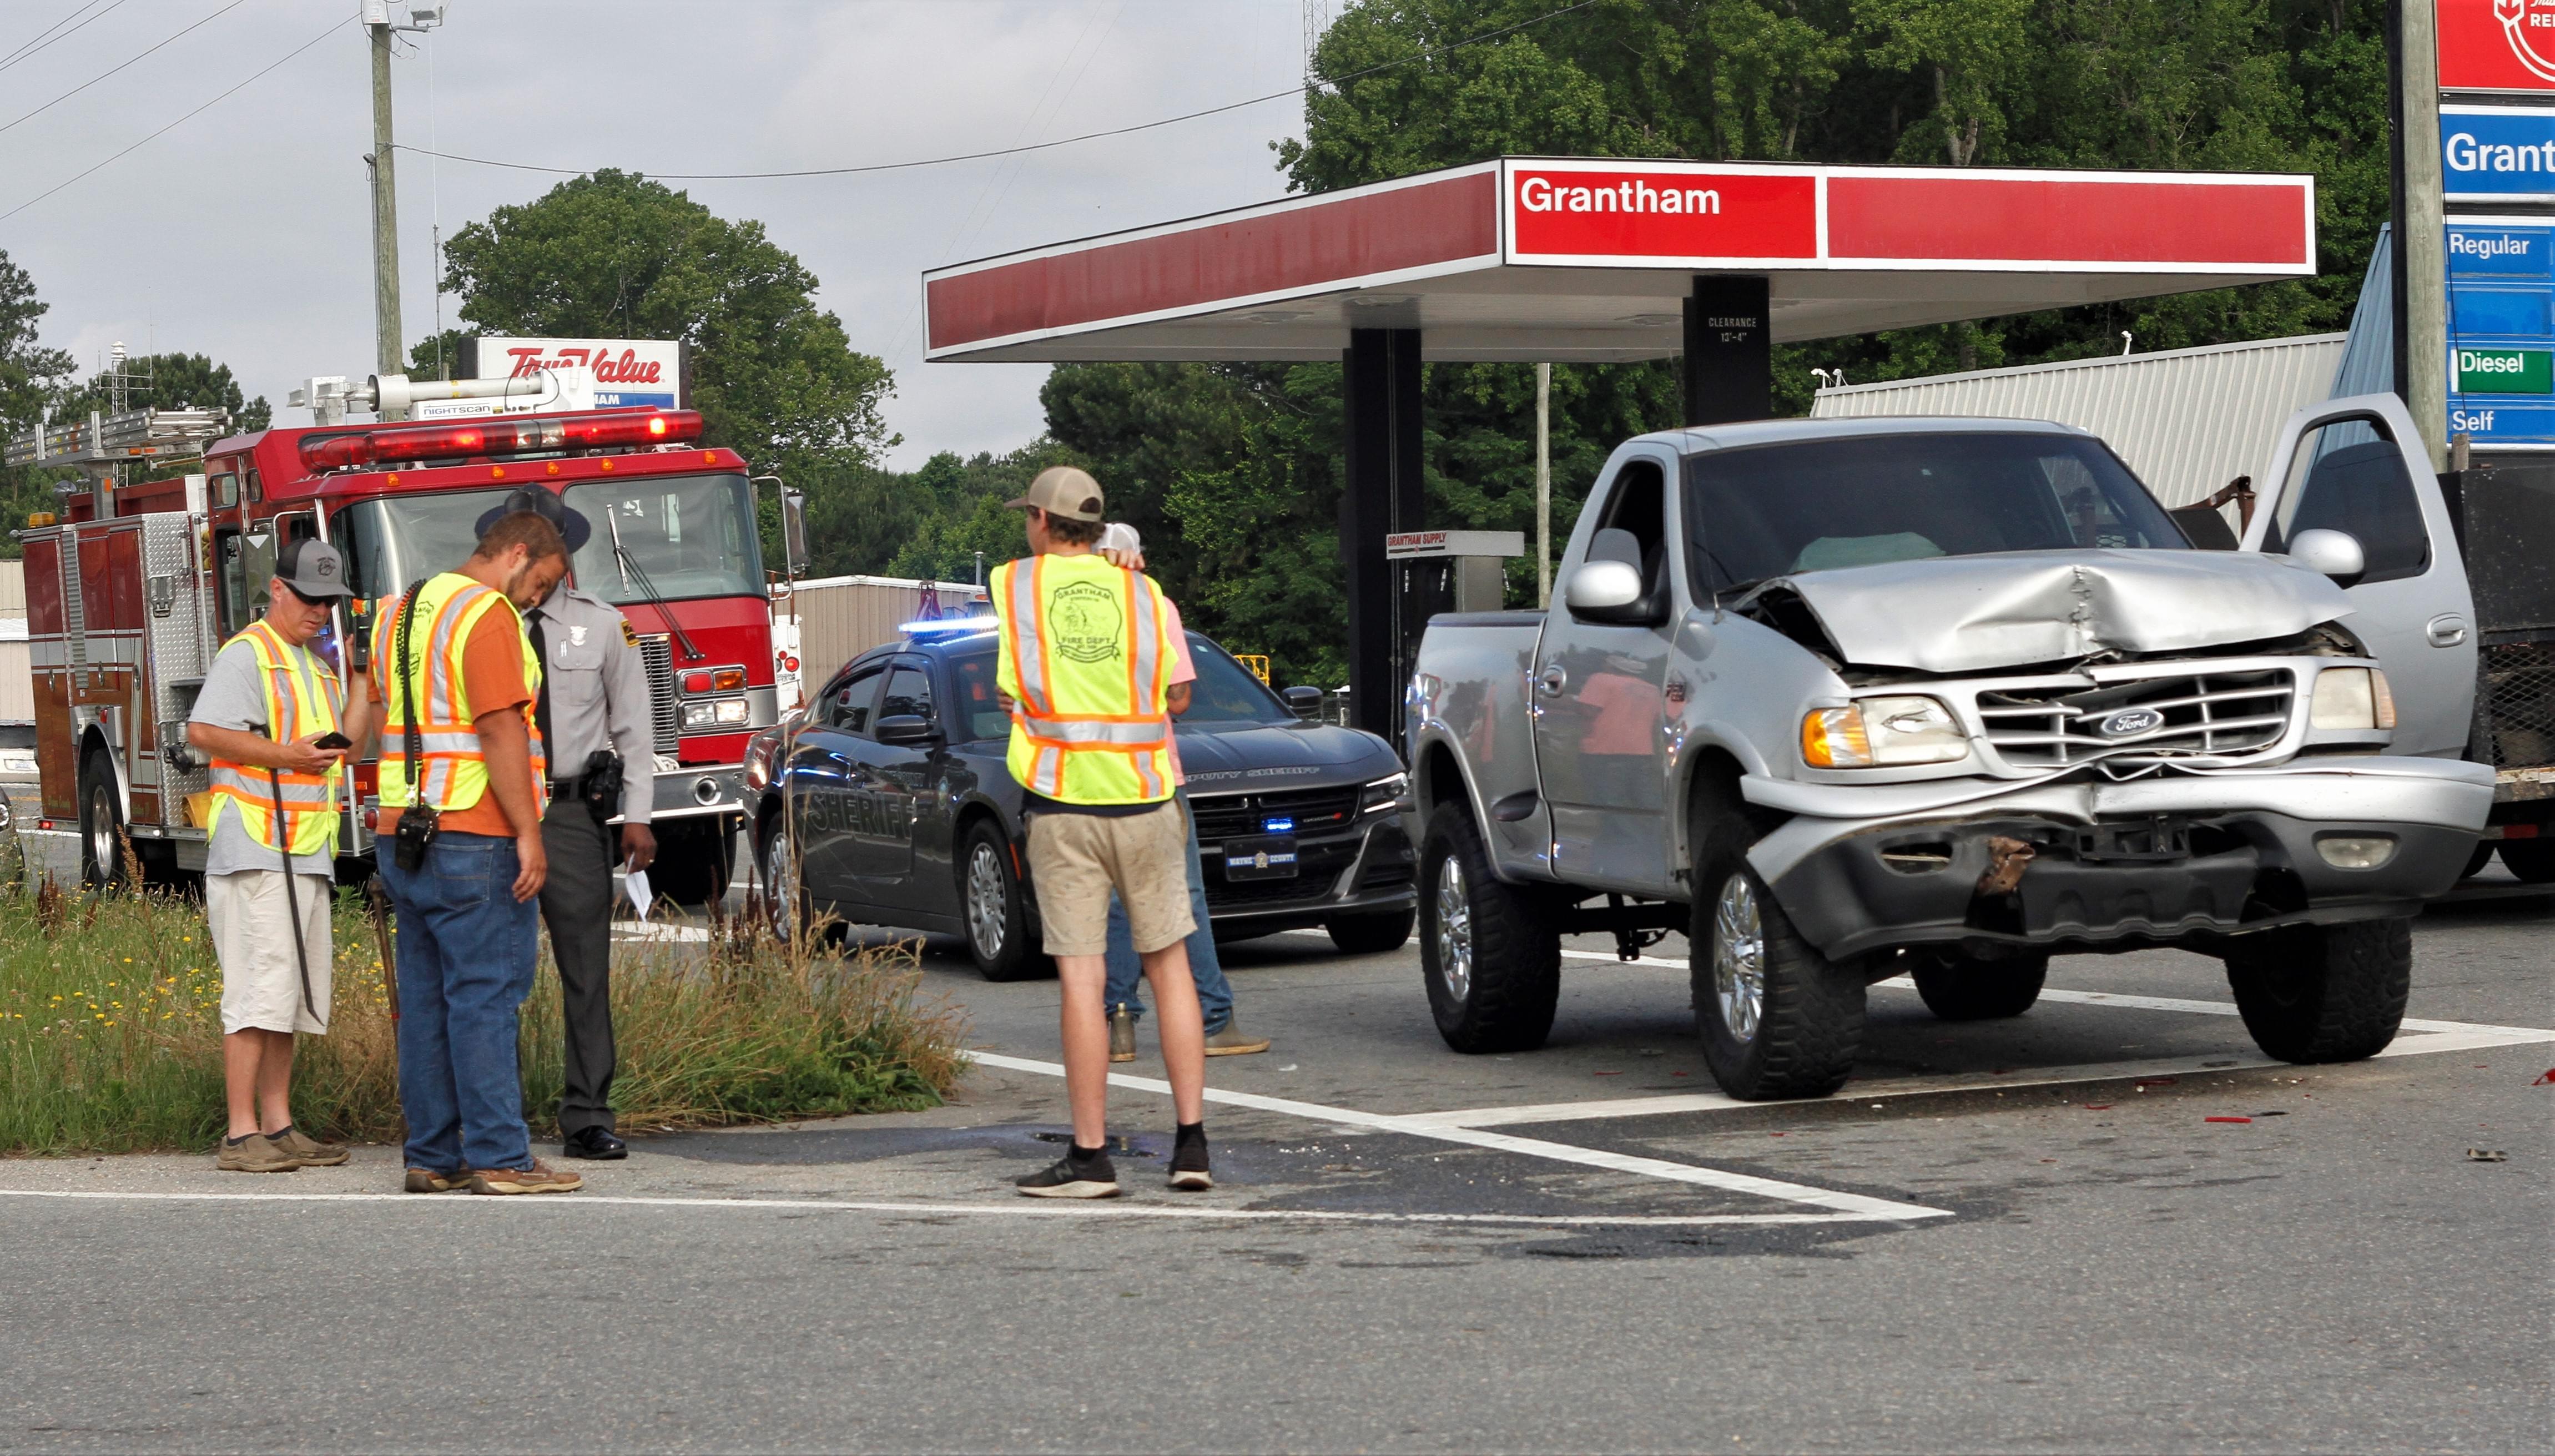 Pickup Trucks Collide In Grantham